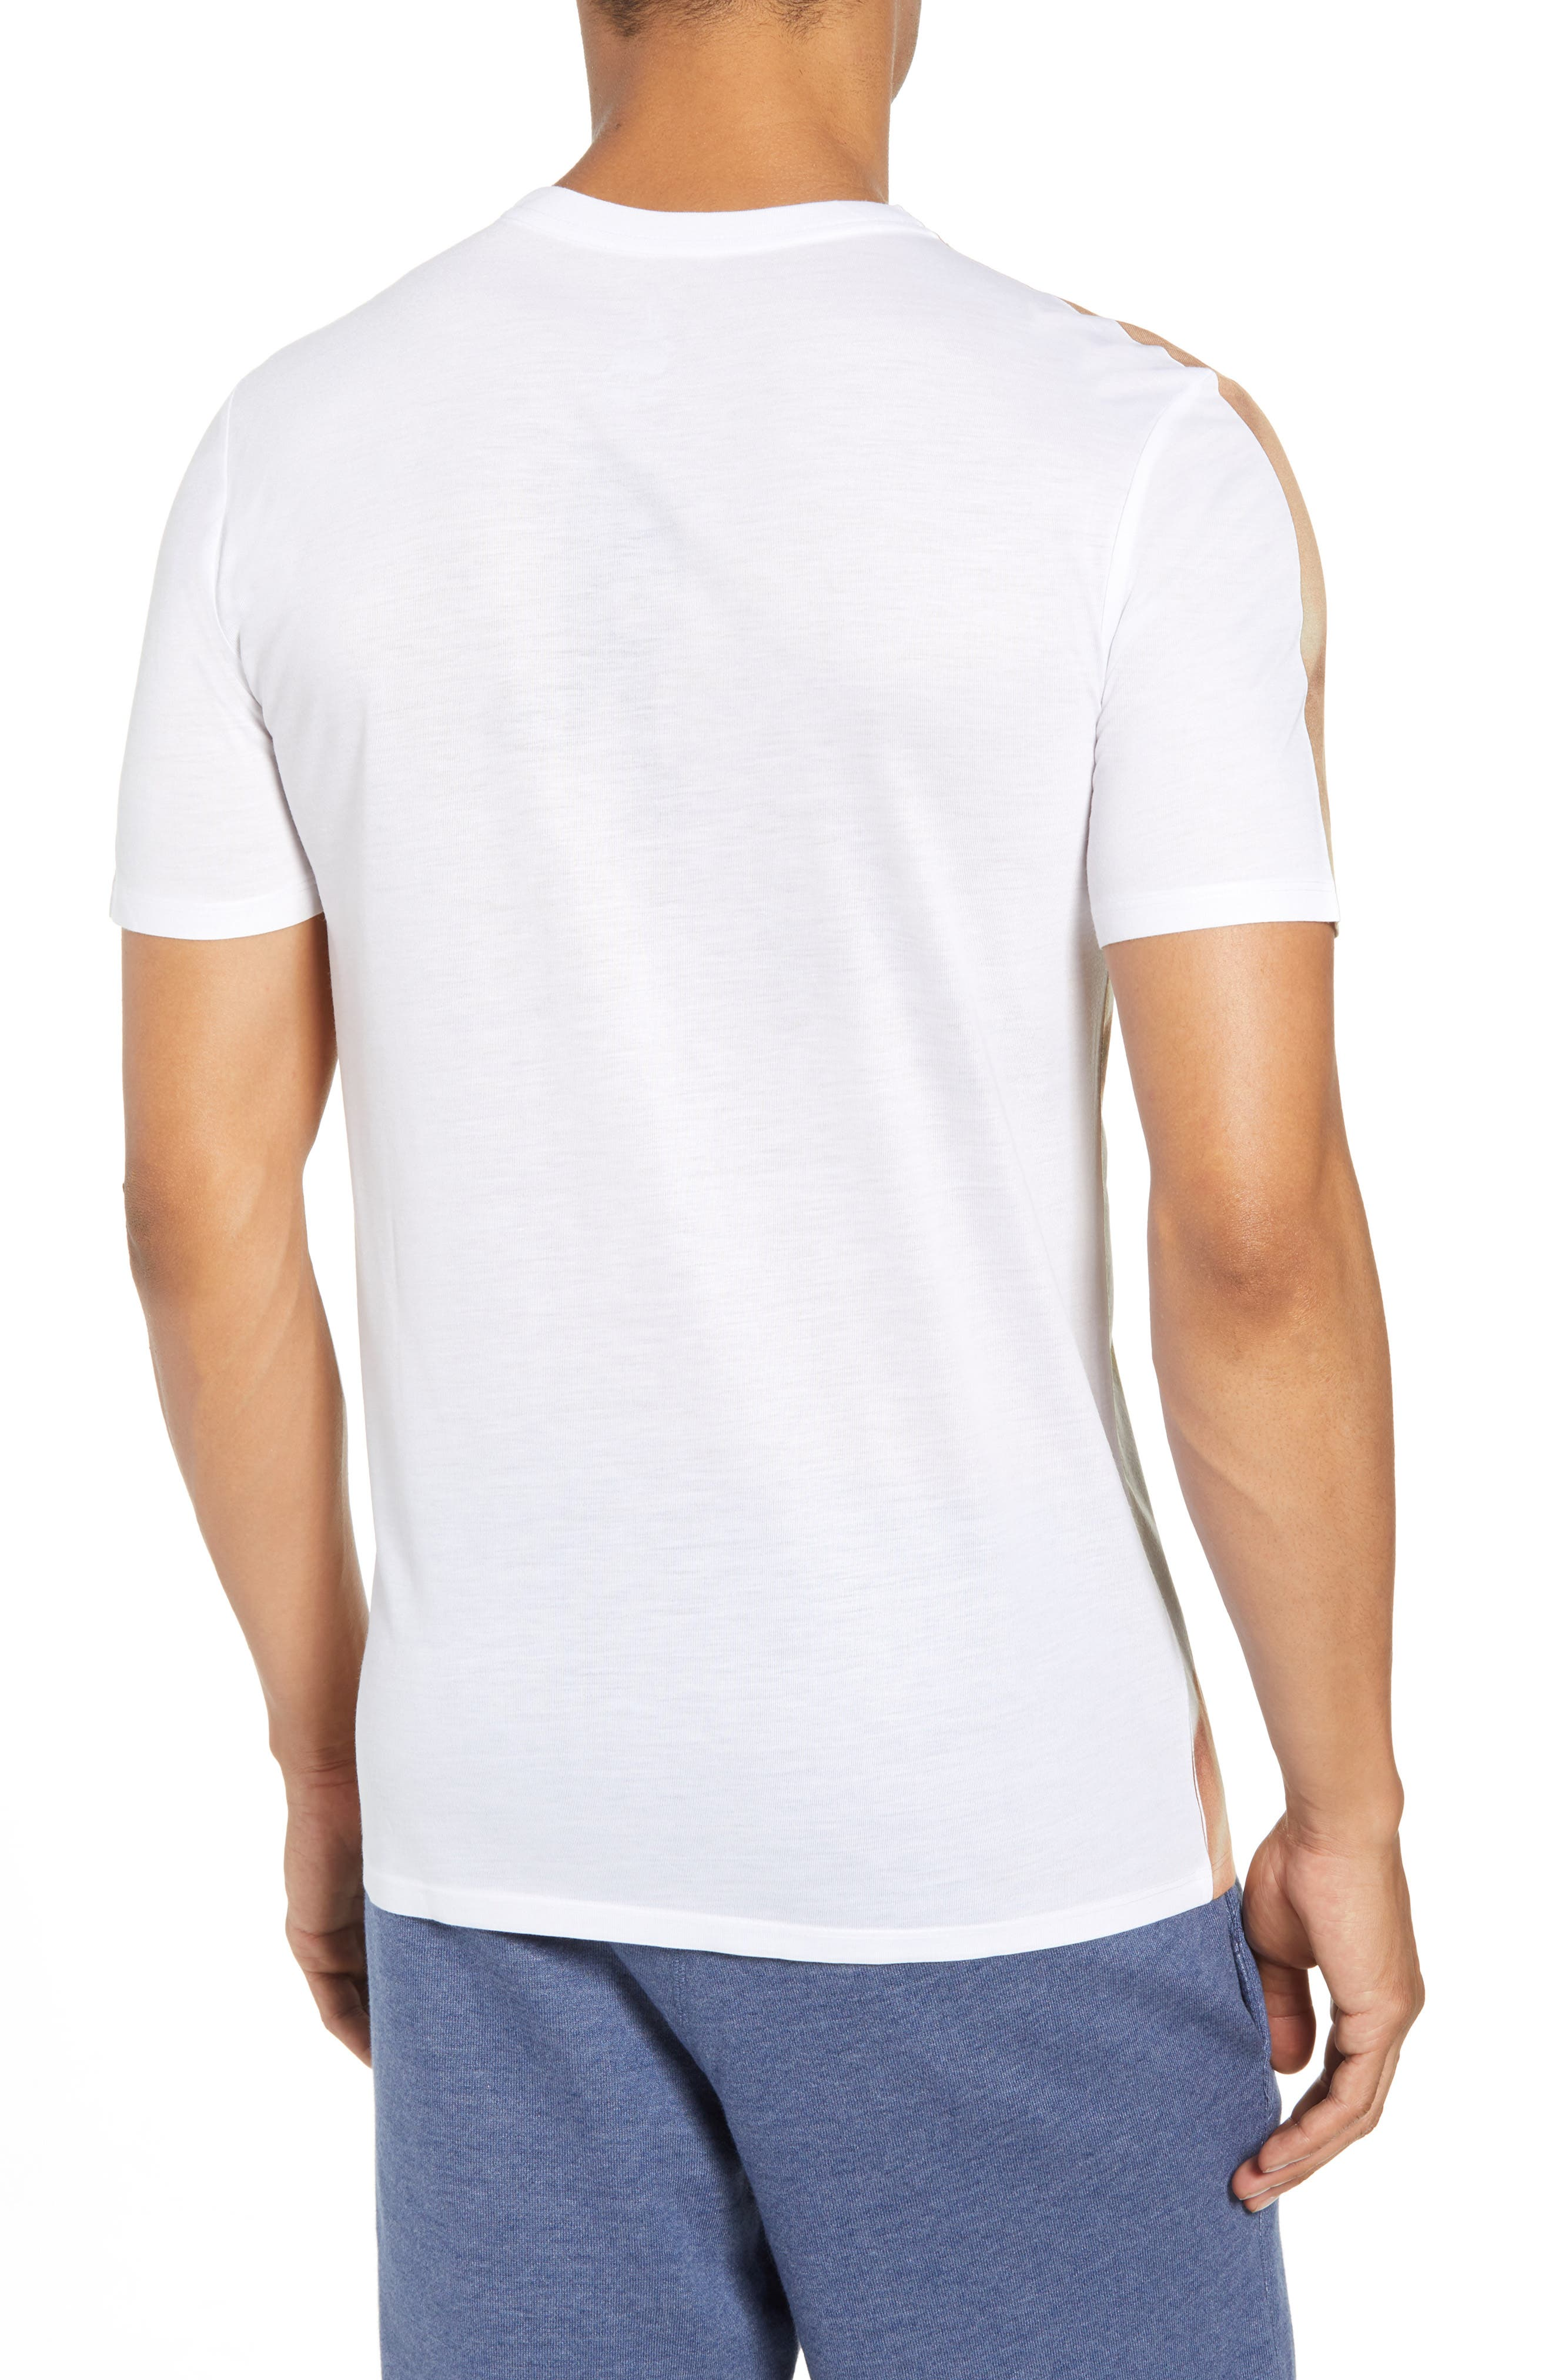 Jordan Sportswear Graphic Shirt,                             Alternate thumbnail 4, color,